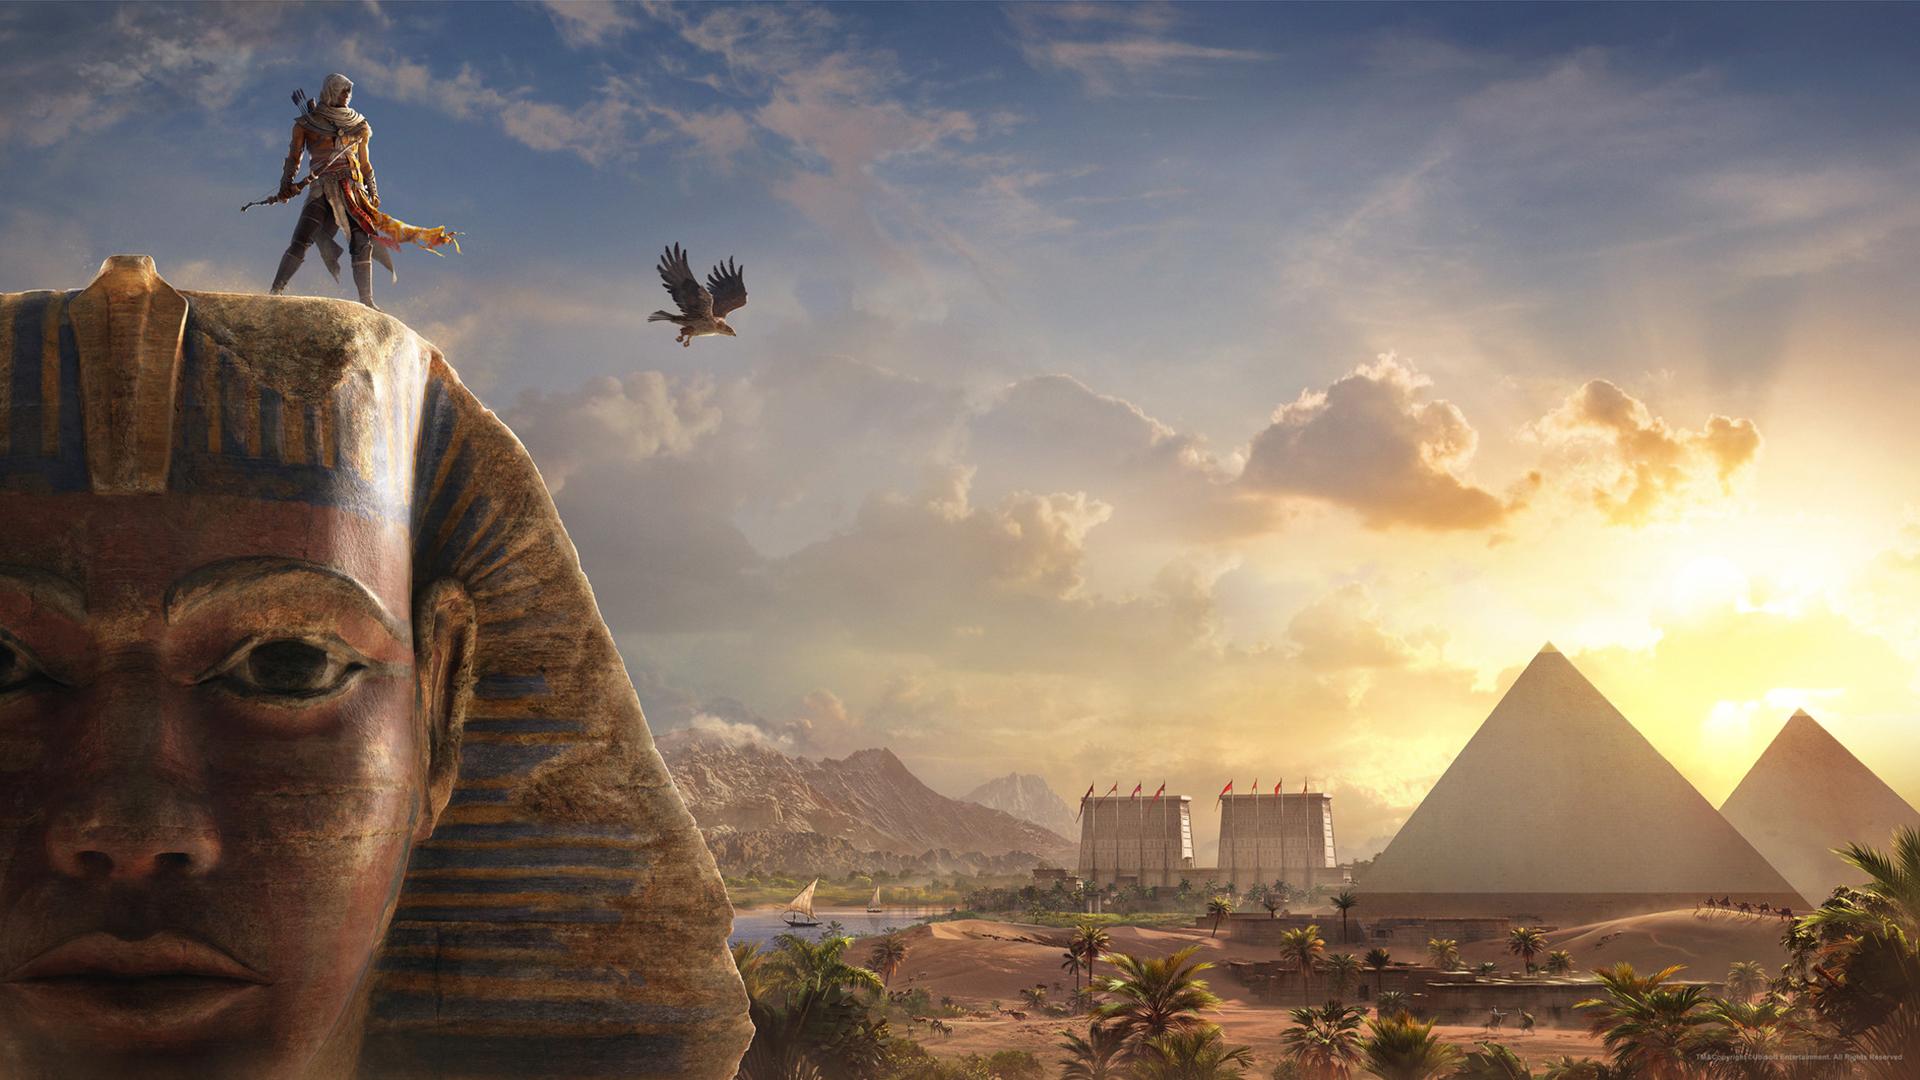 Wallpaper 4k Bayek Sphinx Assassins Creed Origins Assassins Bayek Creed Origins Sphinx Windrunner